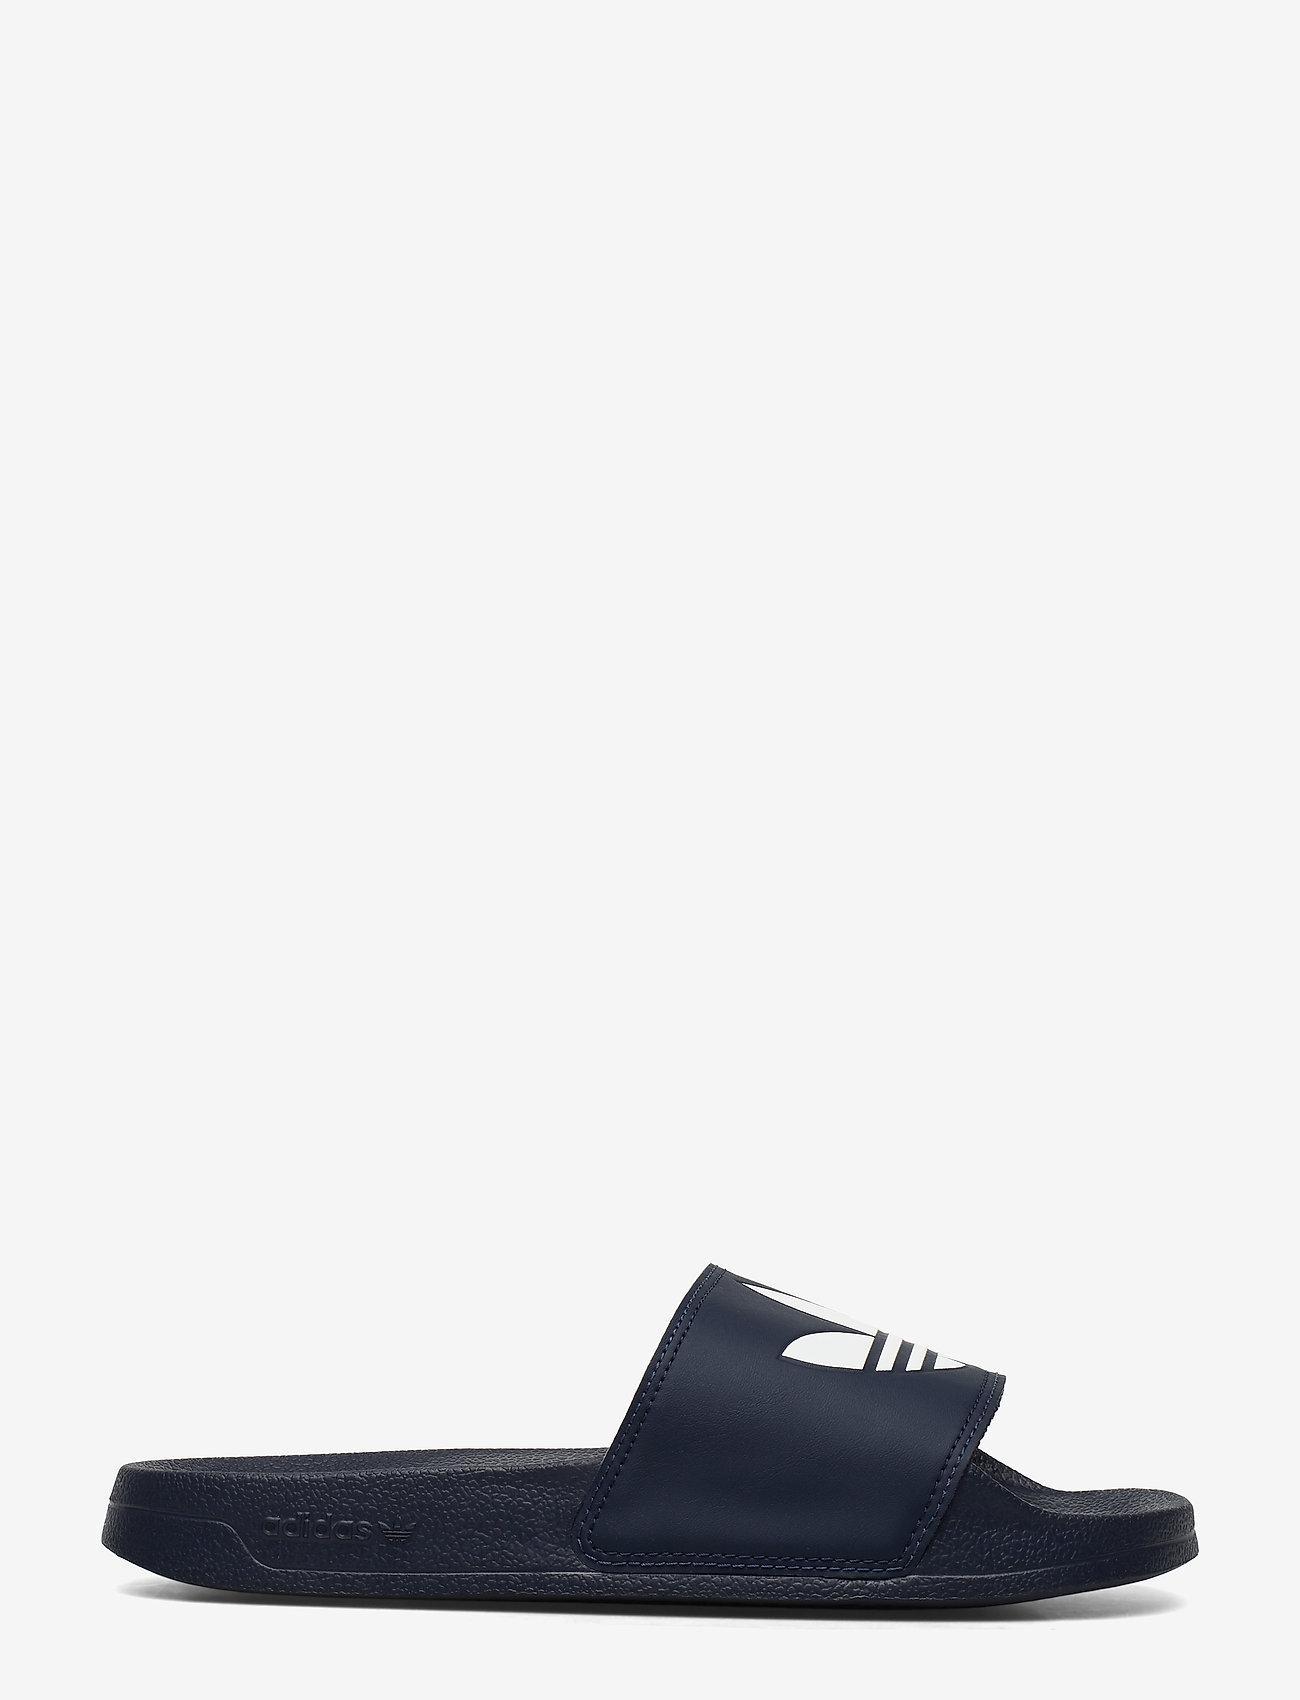 adidas Originals - Adilette Lite Slides - tennarit - conavy/ftwwht/conavy - 1